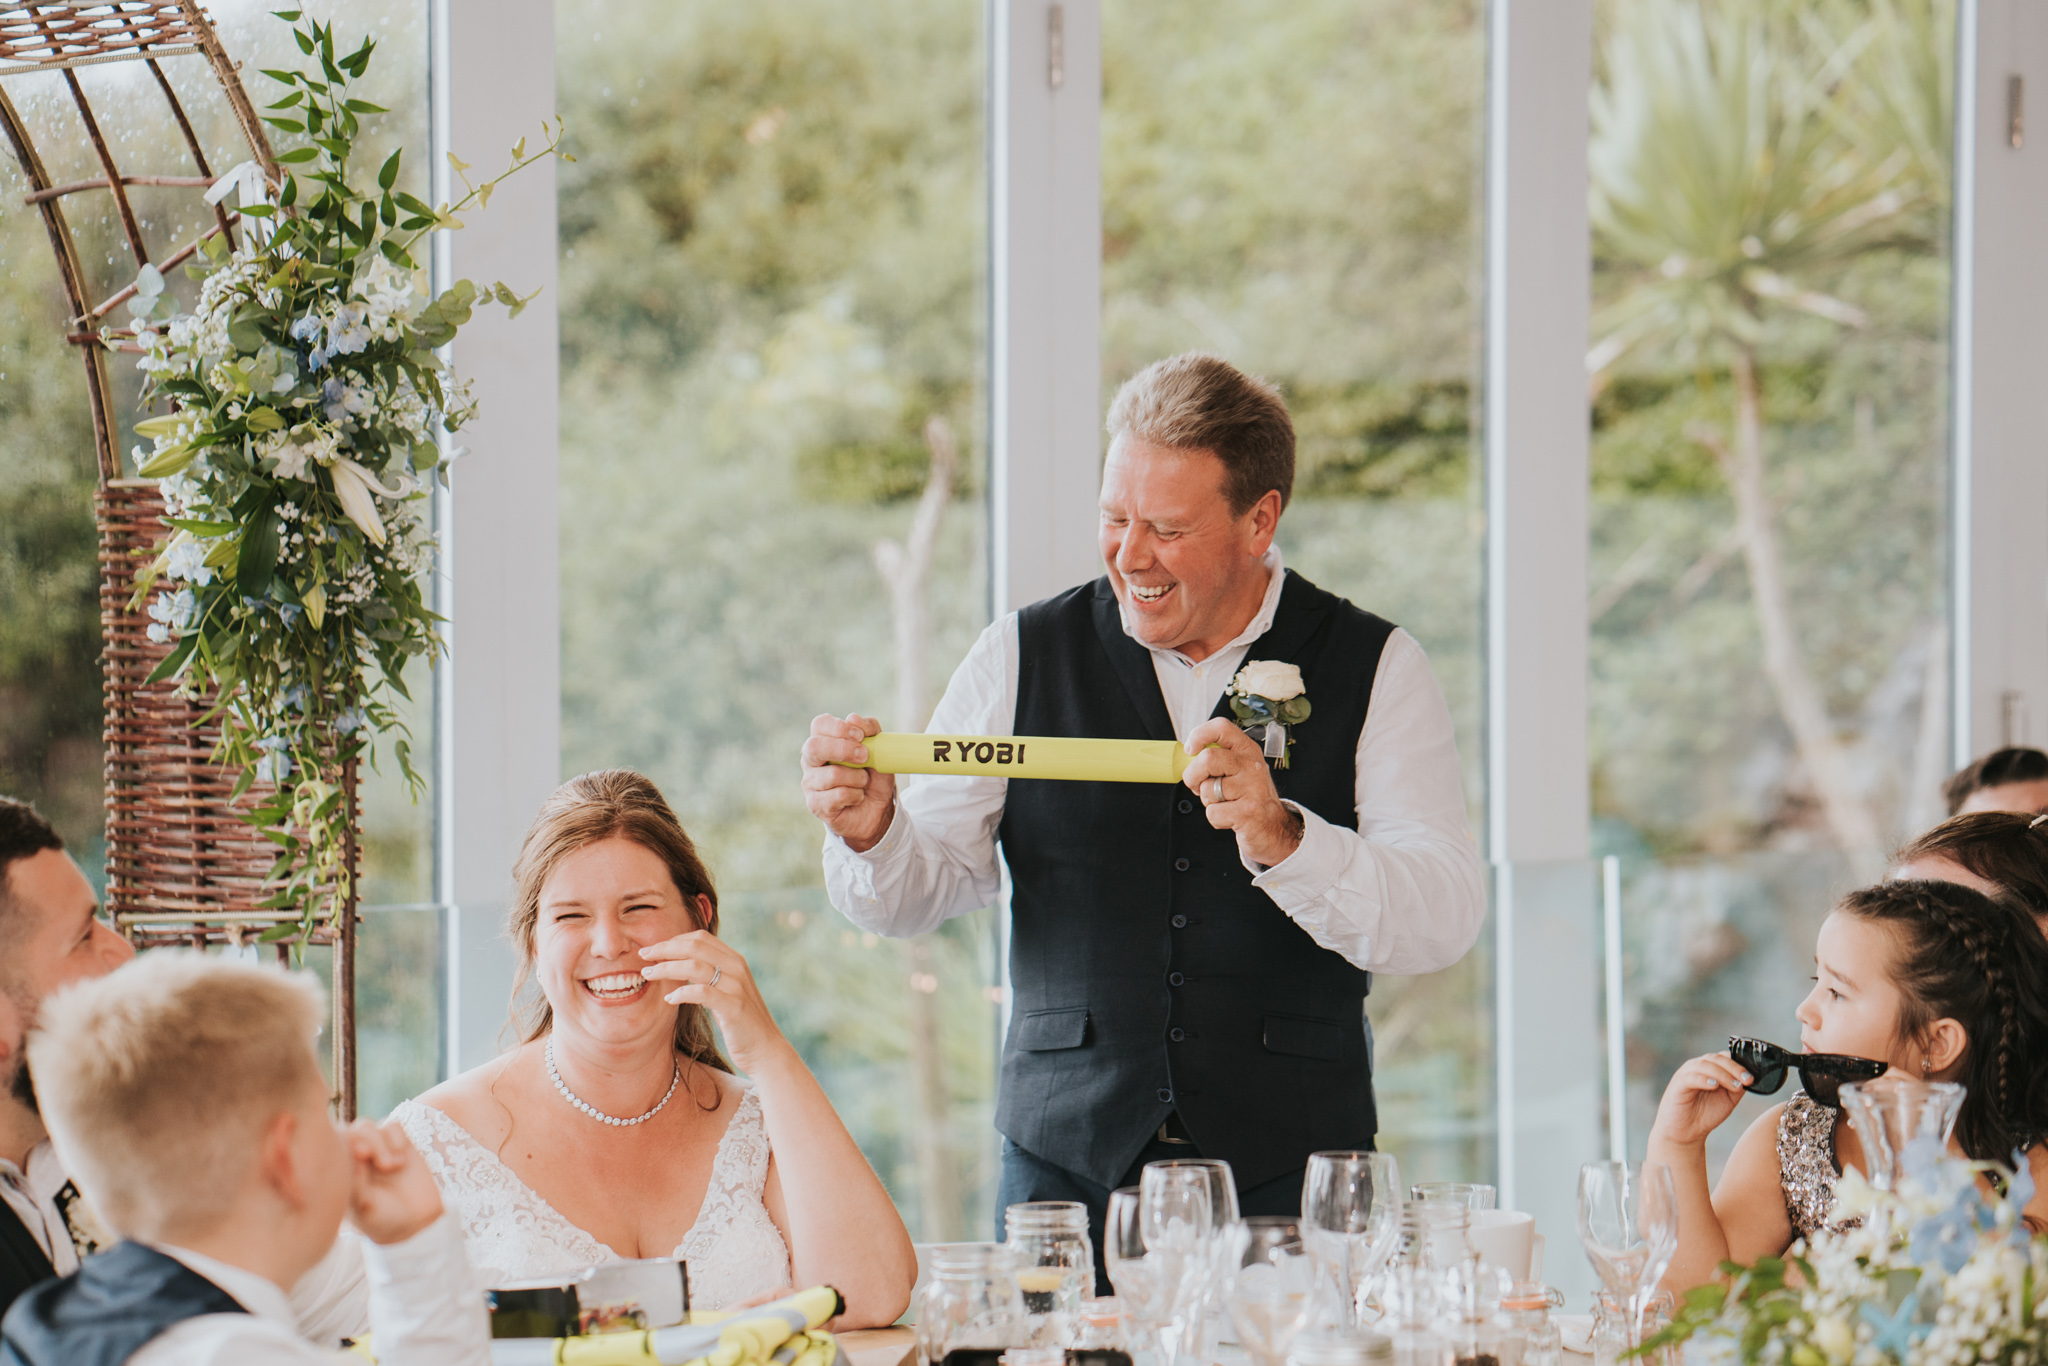 john-amy-relaxed-beach-wedding-tunnels-beaches-ilfracombe-north-devon-grace-elizabeth-colchester-essex-alternative-relaxed-wedding-photography-devon-suffolk-norfolk-essex (116 of 159).jpg